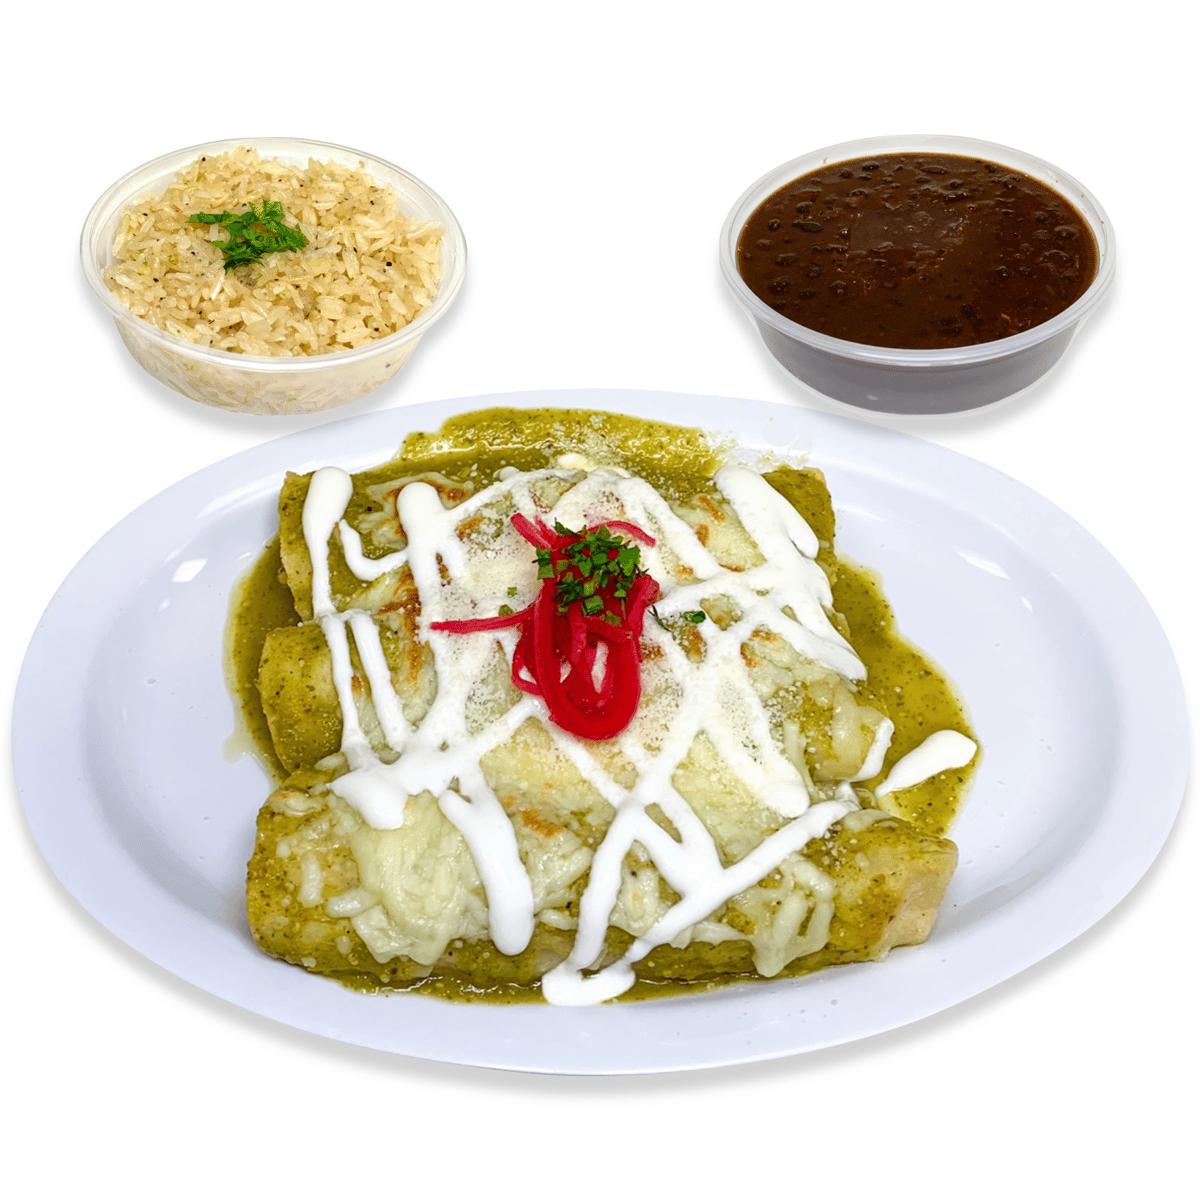 41. Roasted & Grilled Veggies Enchiladas